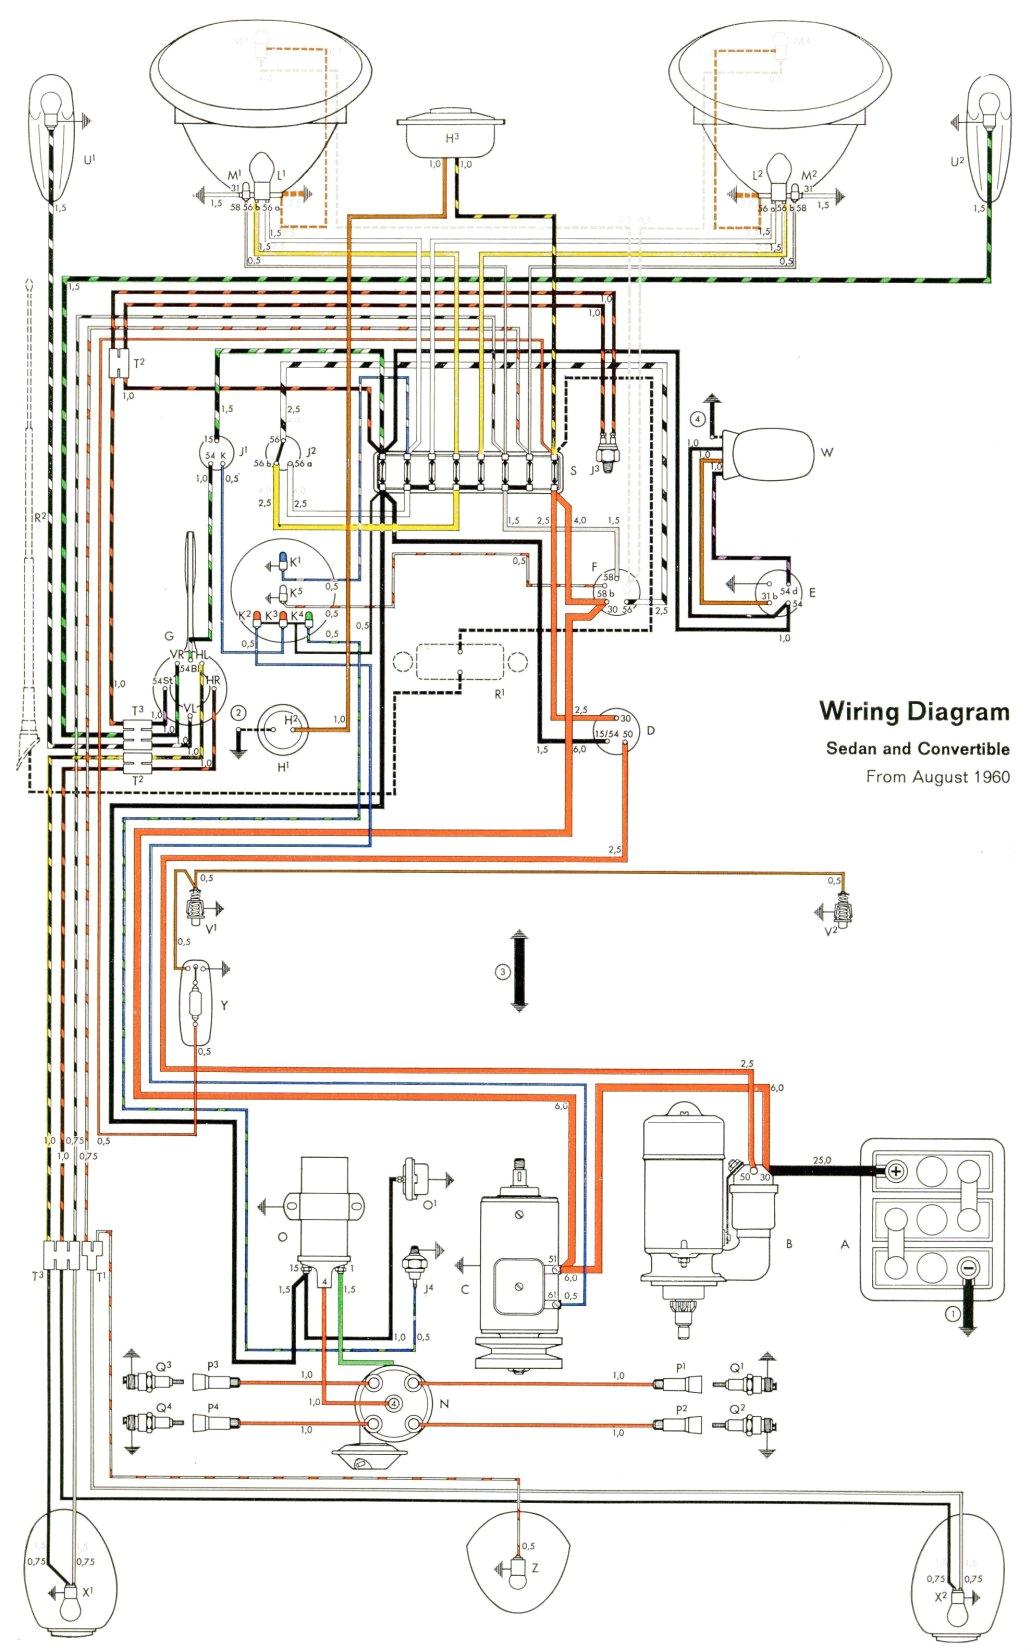 wiring diagram for volkswagen user vw caddy thesamba com type 1 t4 fresh 2 diagrams jpg